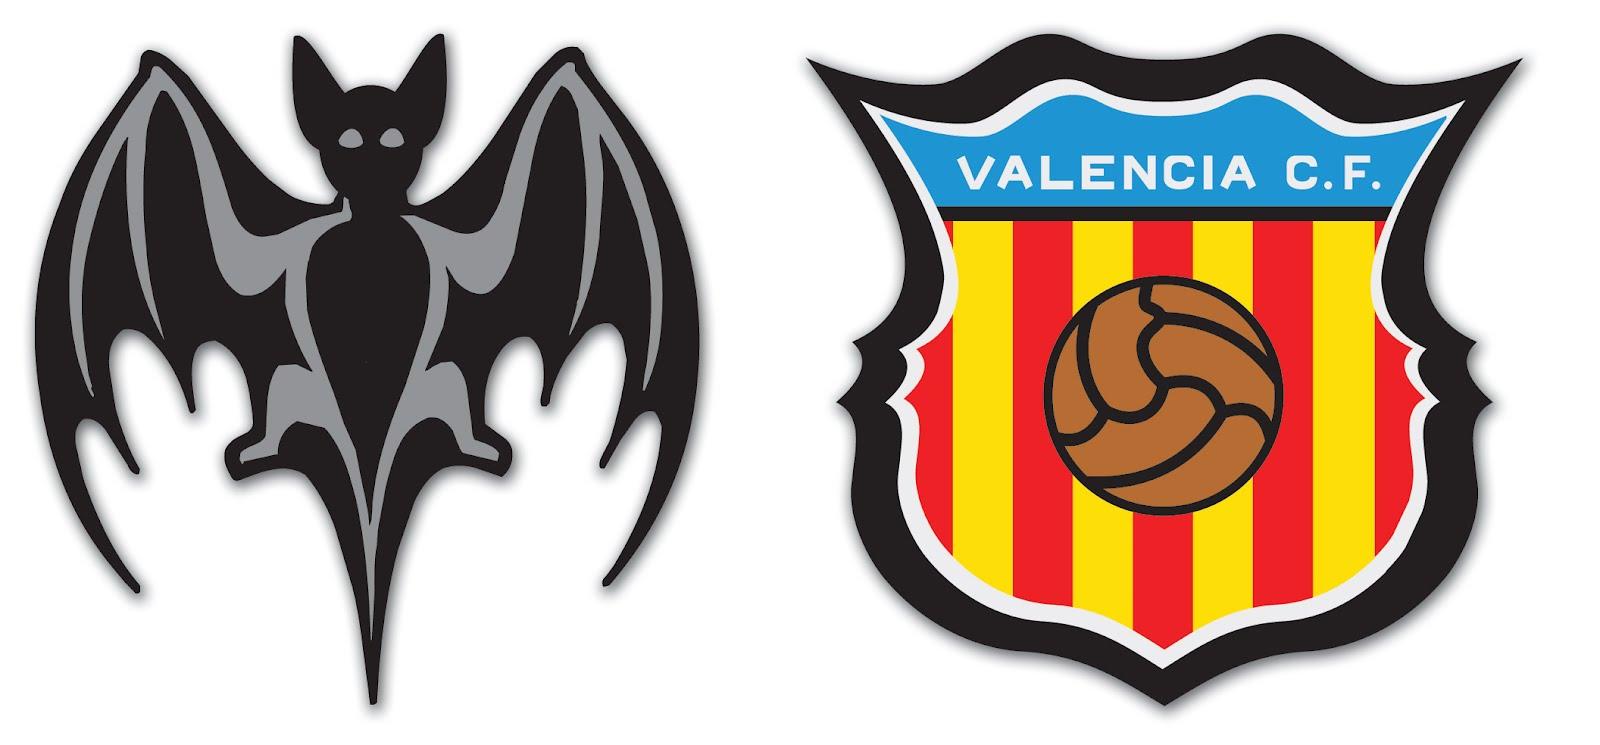 Valencia CF Symbol wallpapers HD